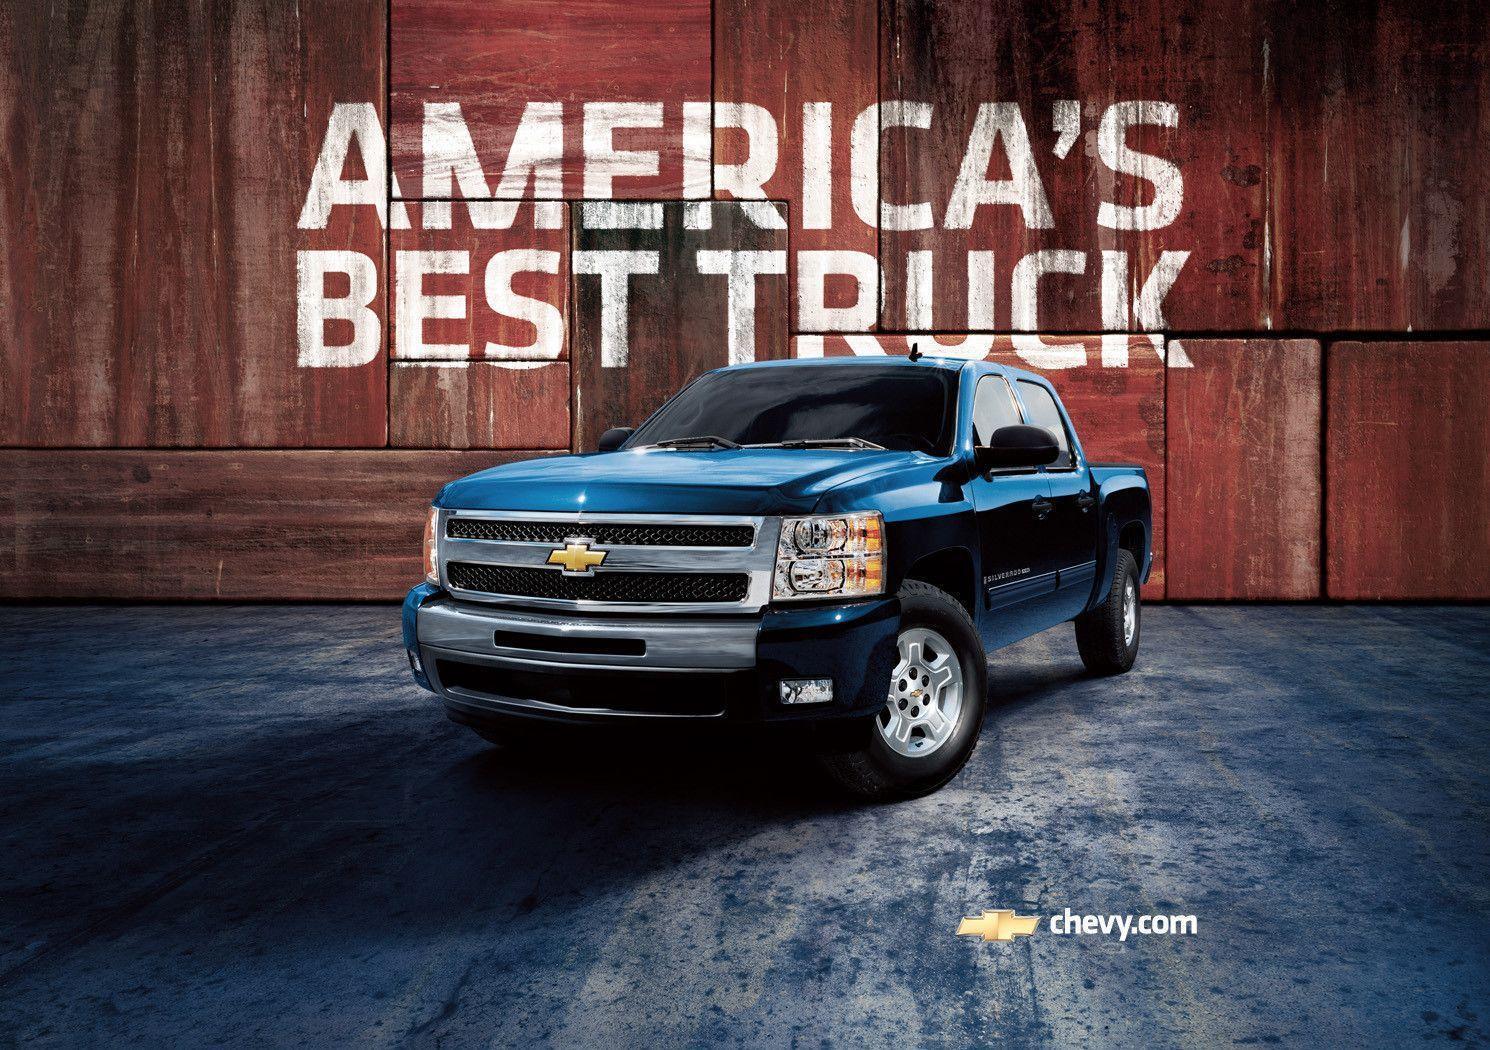 best truck wallpapers - photo #36